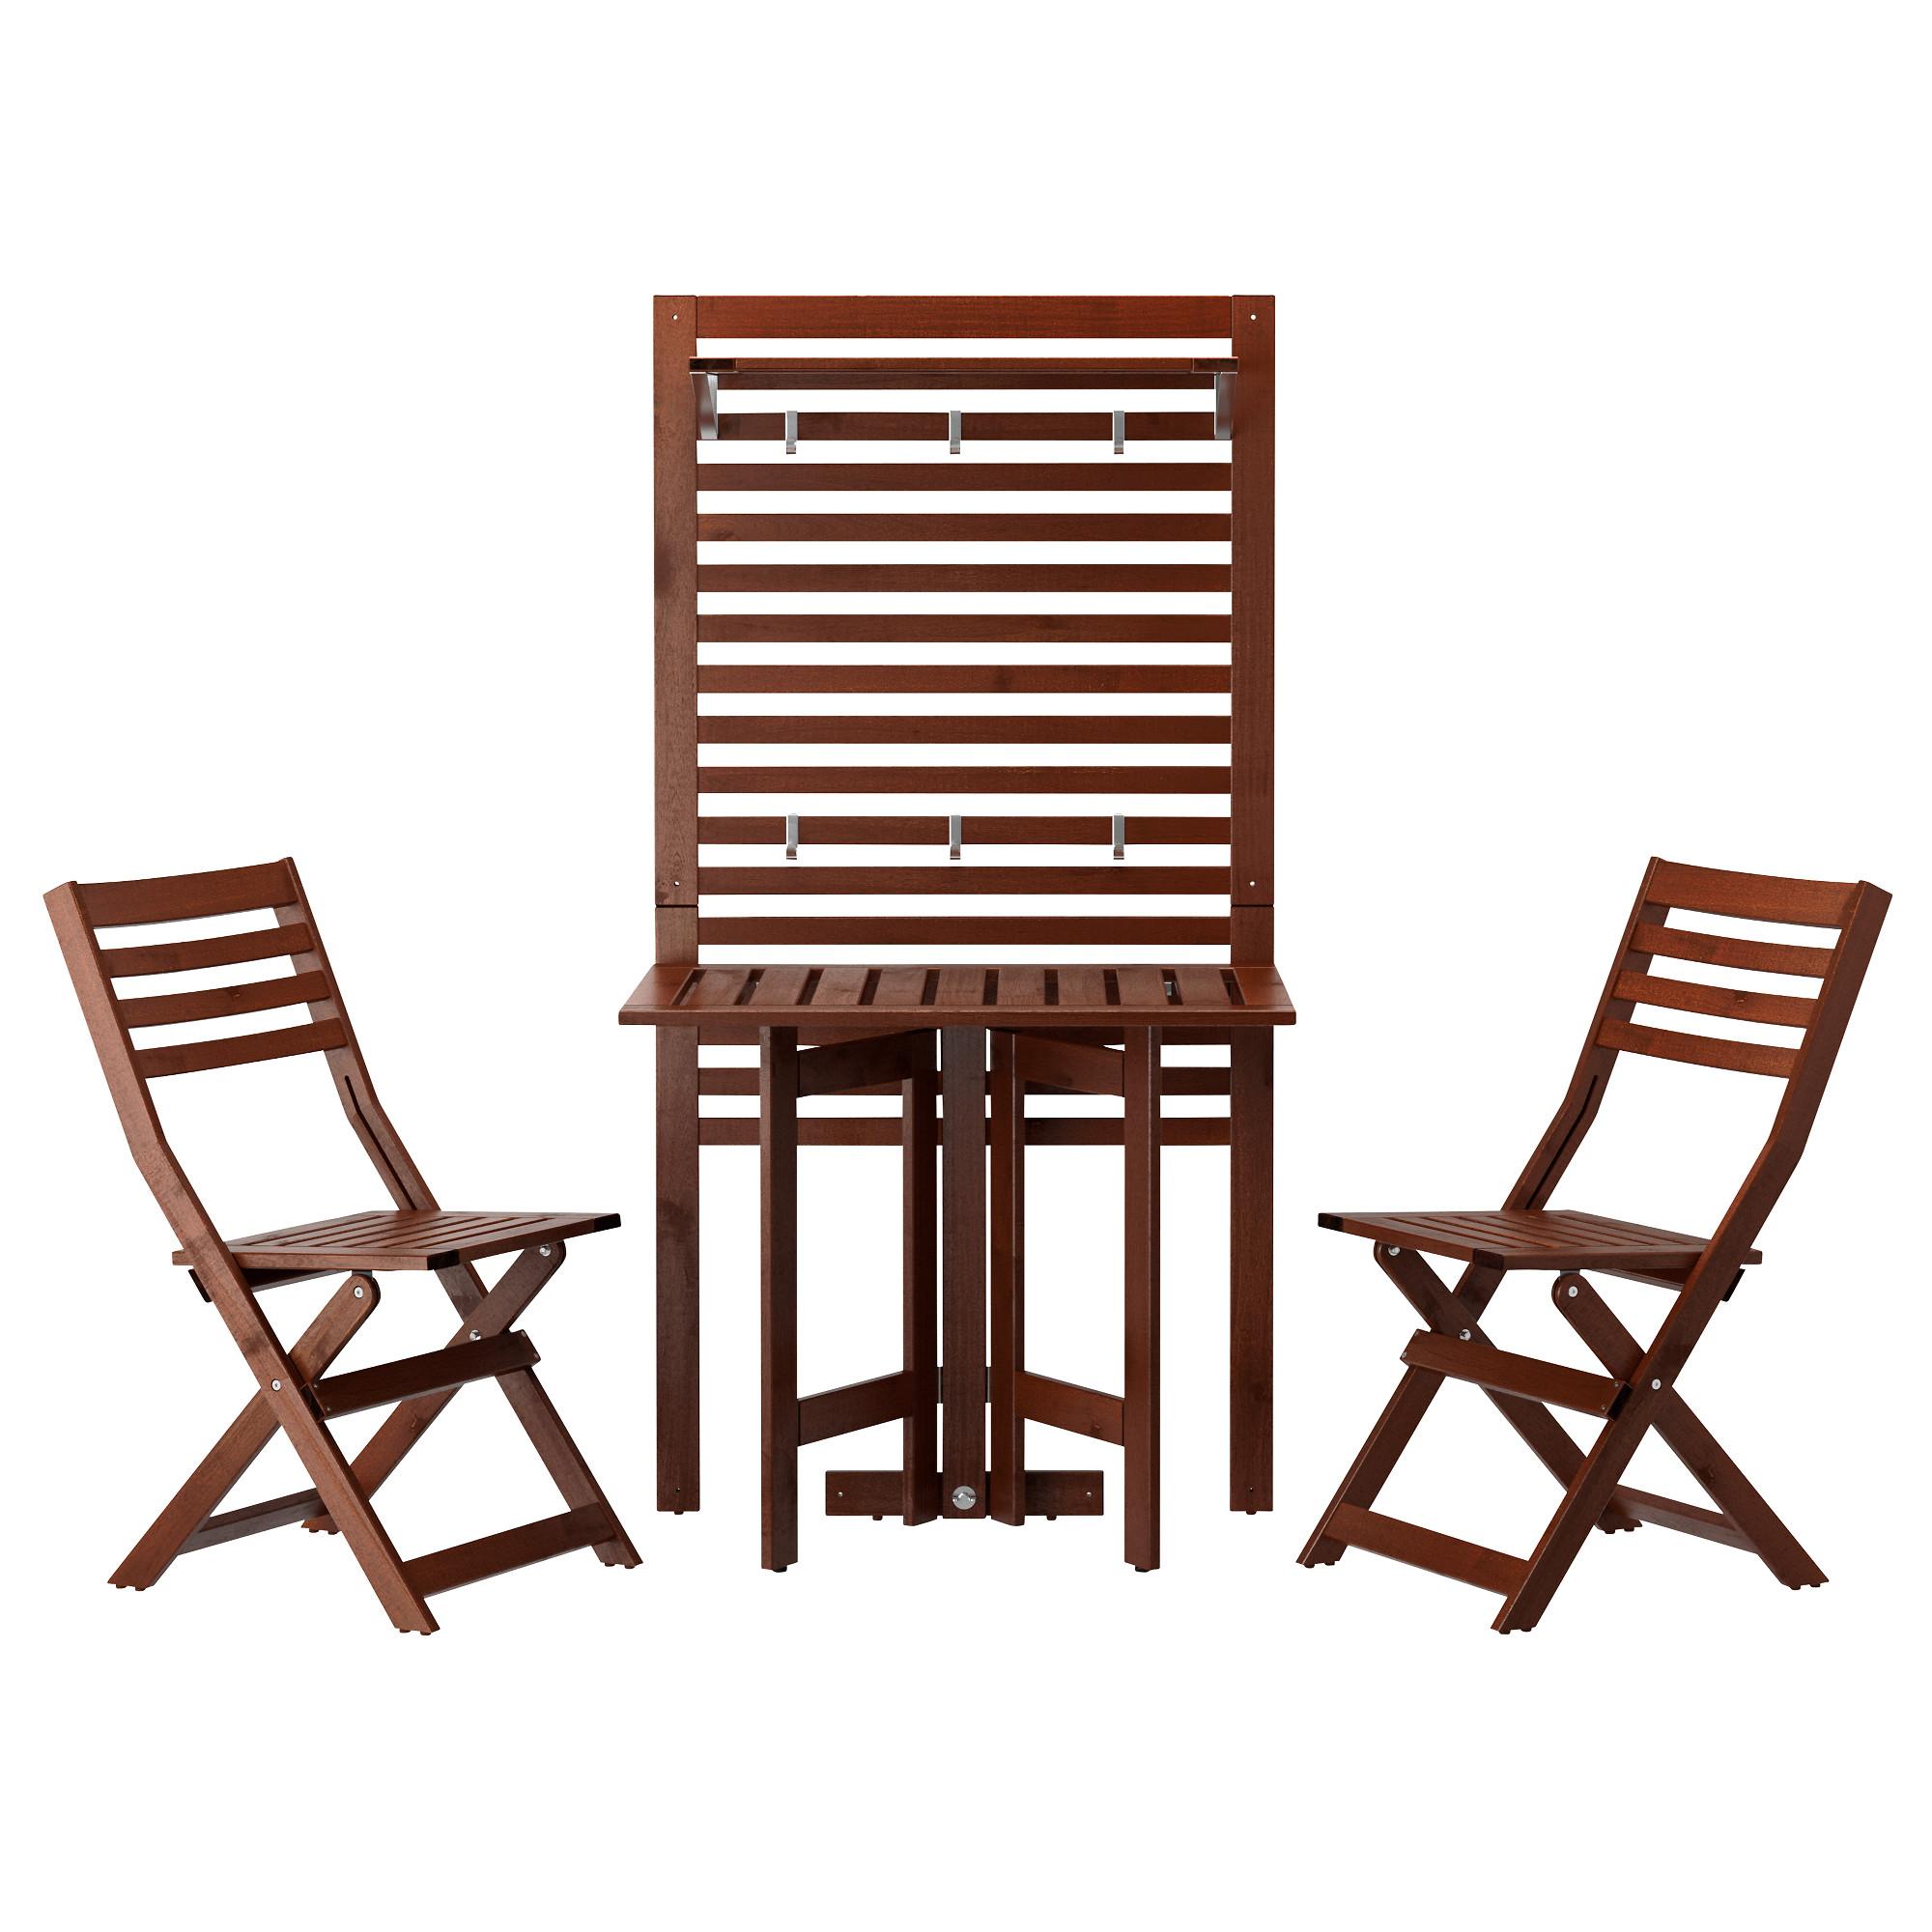 Панель, стол, 2 стула ЭПЛАРО артикуль № 692.288.78 в наличии. Интернет каталог IKEA Беларусь. Недорогая доставка и монтаж.